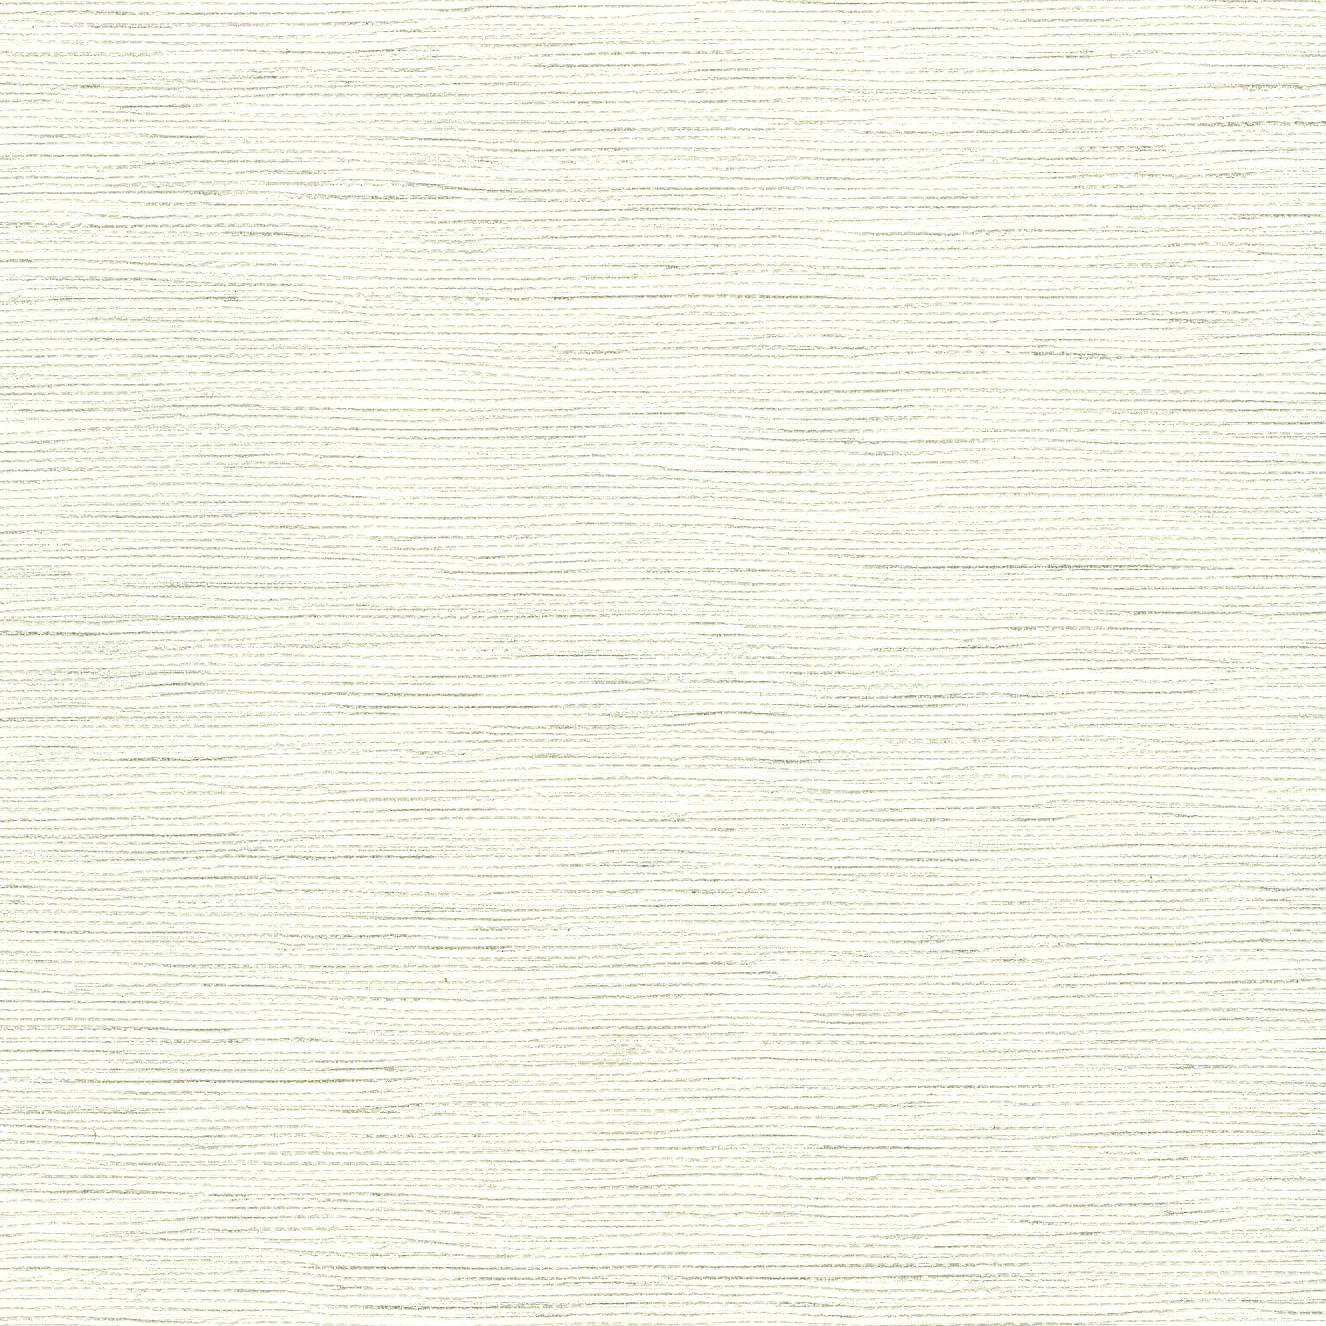 Papel de Parede Pure 2 Fio a Fio 187106 - Rolo: 10m x 0,53m